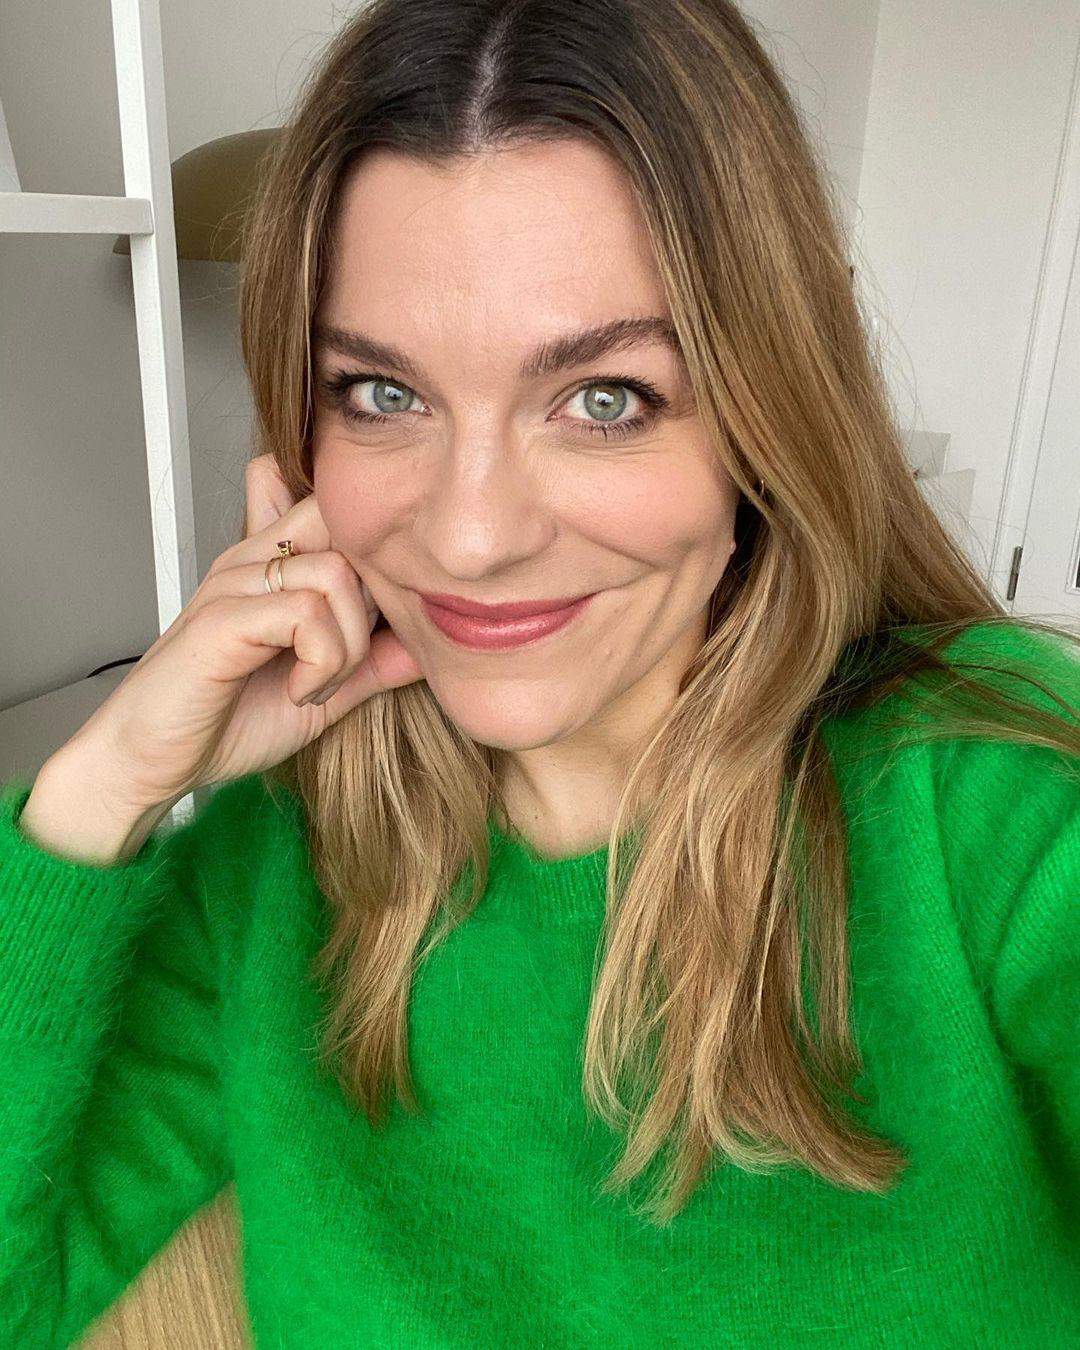 Beauty Bloggerin Hanna Schumi im Interview